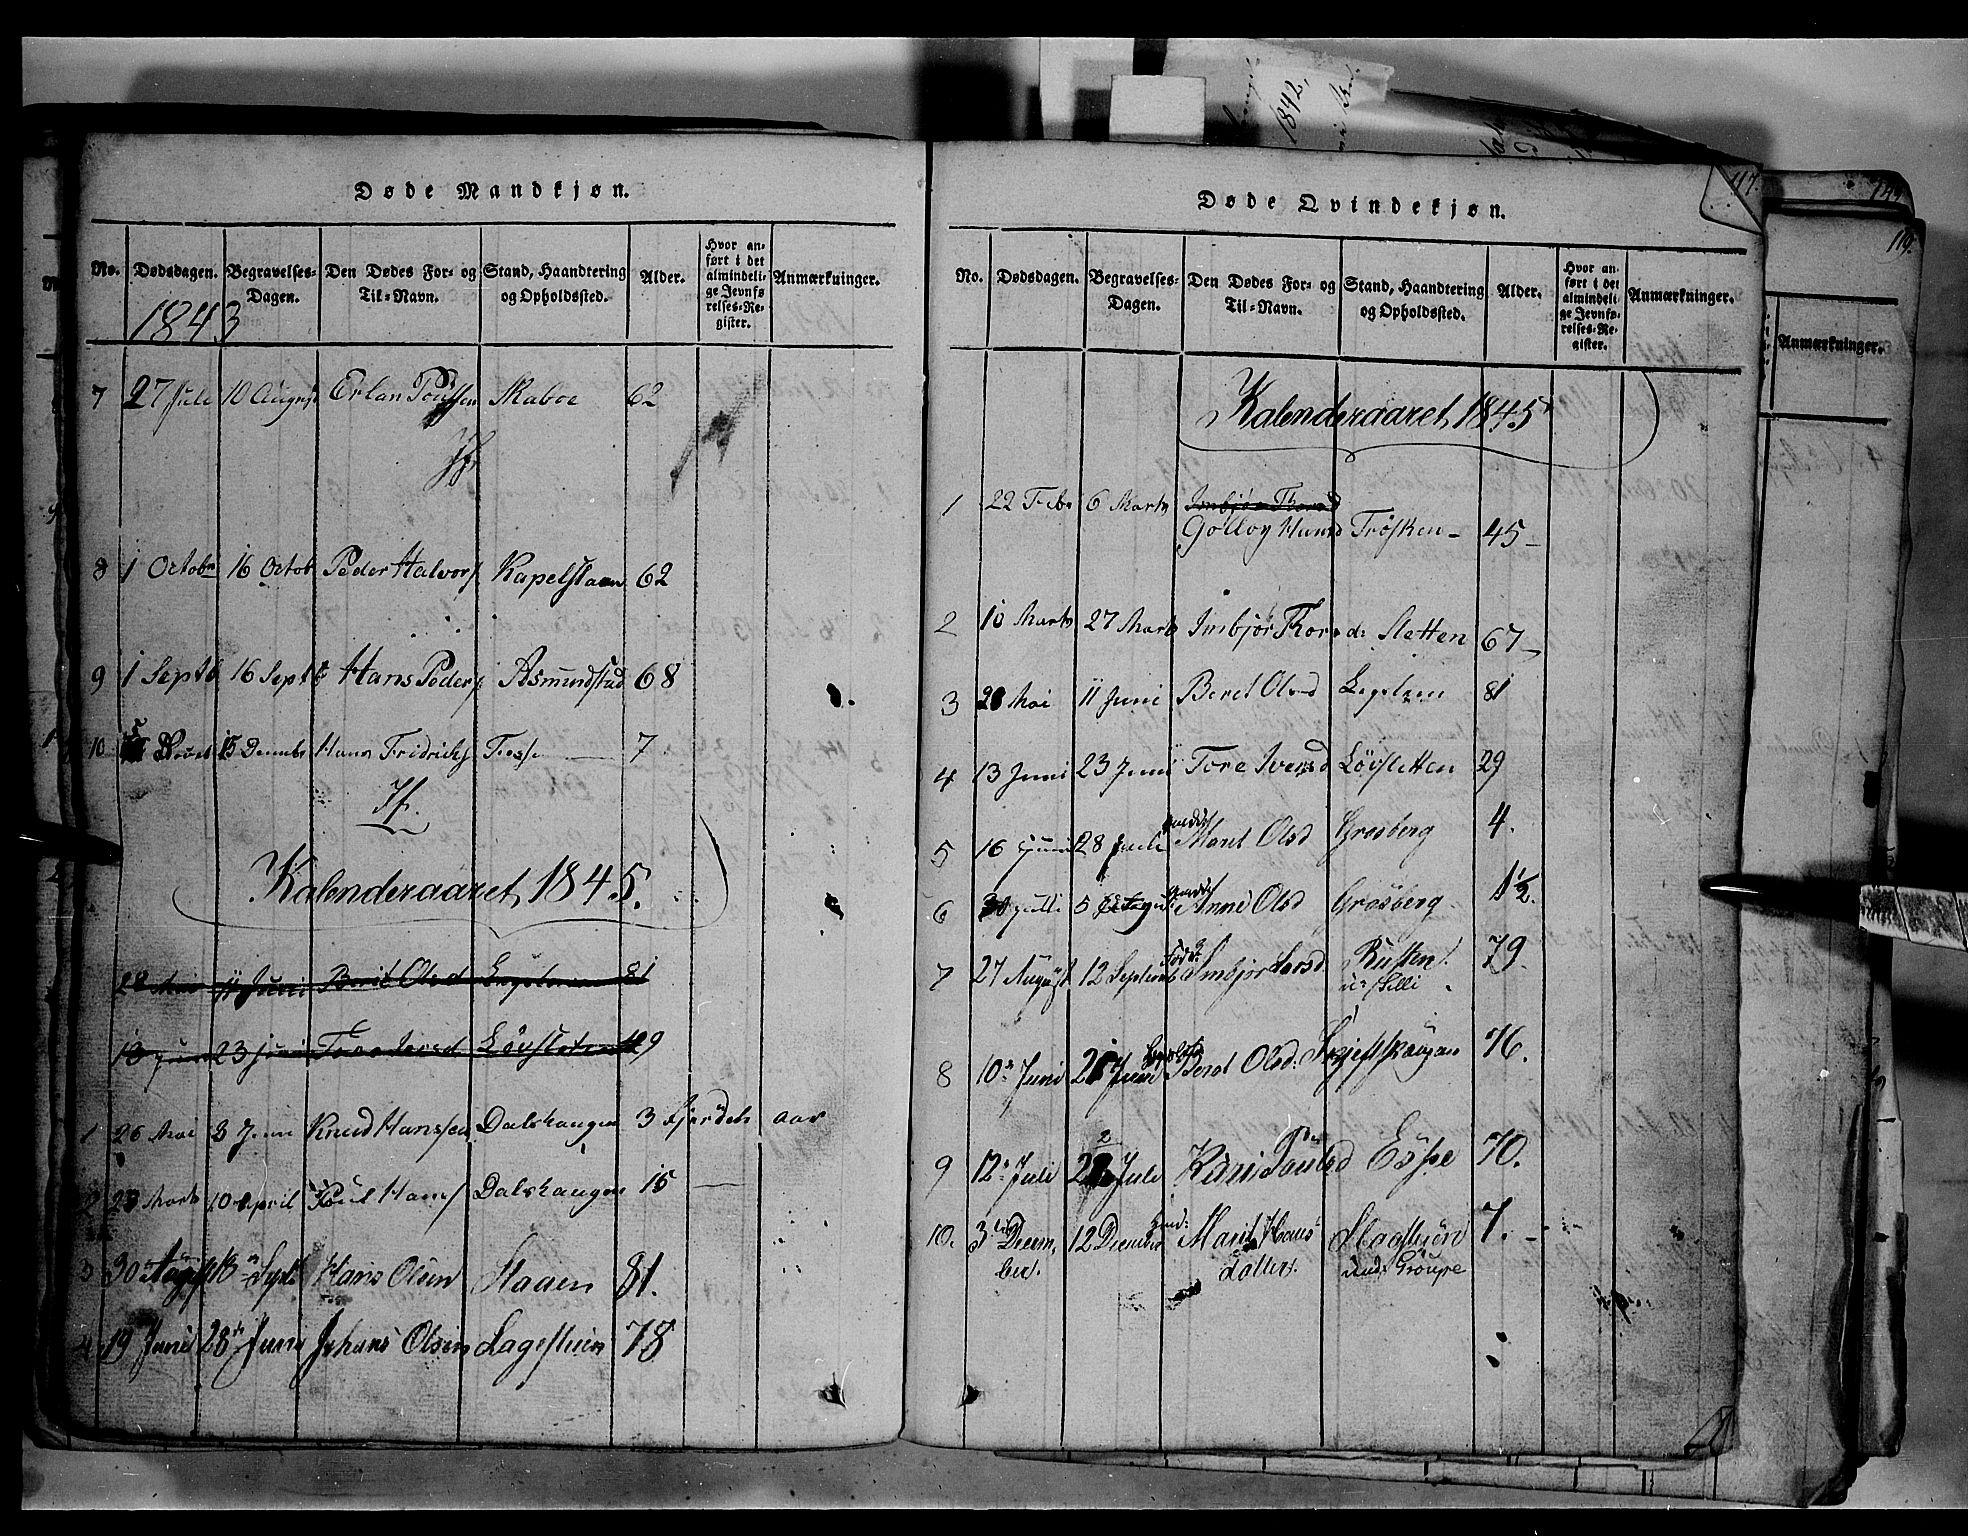 SAH, Fron prestekontor, H/Ha/Hab/L0003: Klokkerbok nr. 3, 1816-1850, s. 115